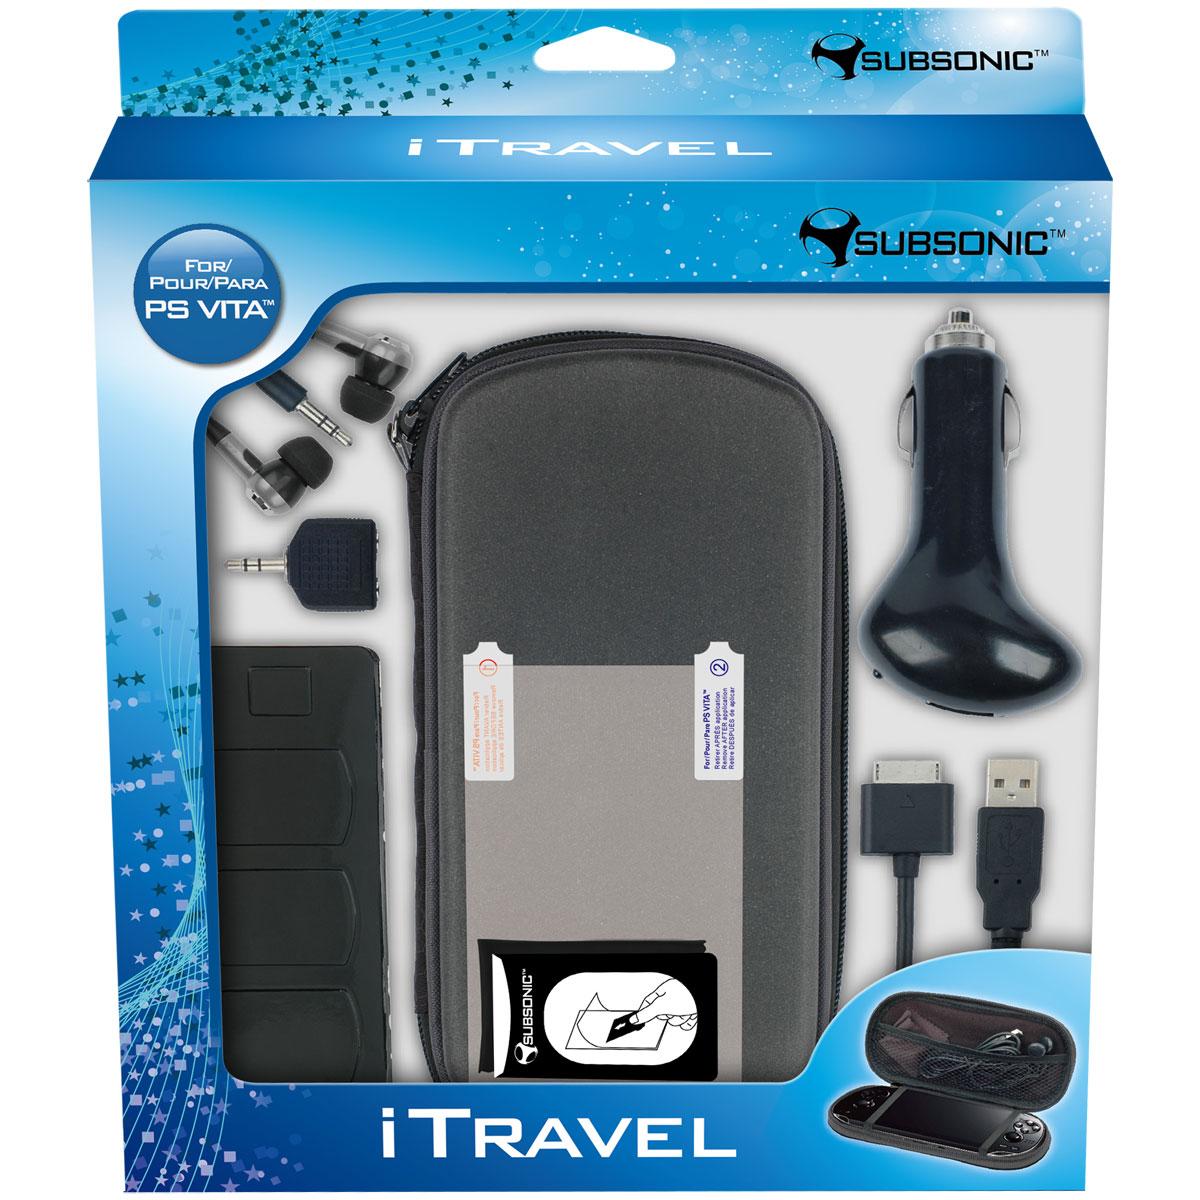 Accessoires PS Vita SubSonic iTravel (PS Vita) Sacoche + boitier de transport + film de protection + câble USB + allume-cigare pour PS Vita